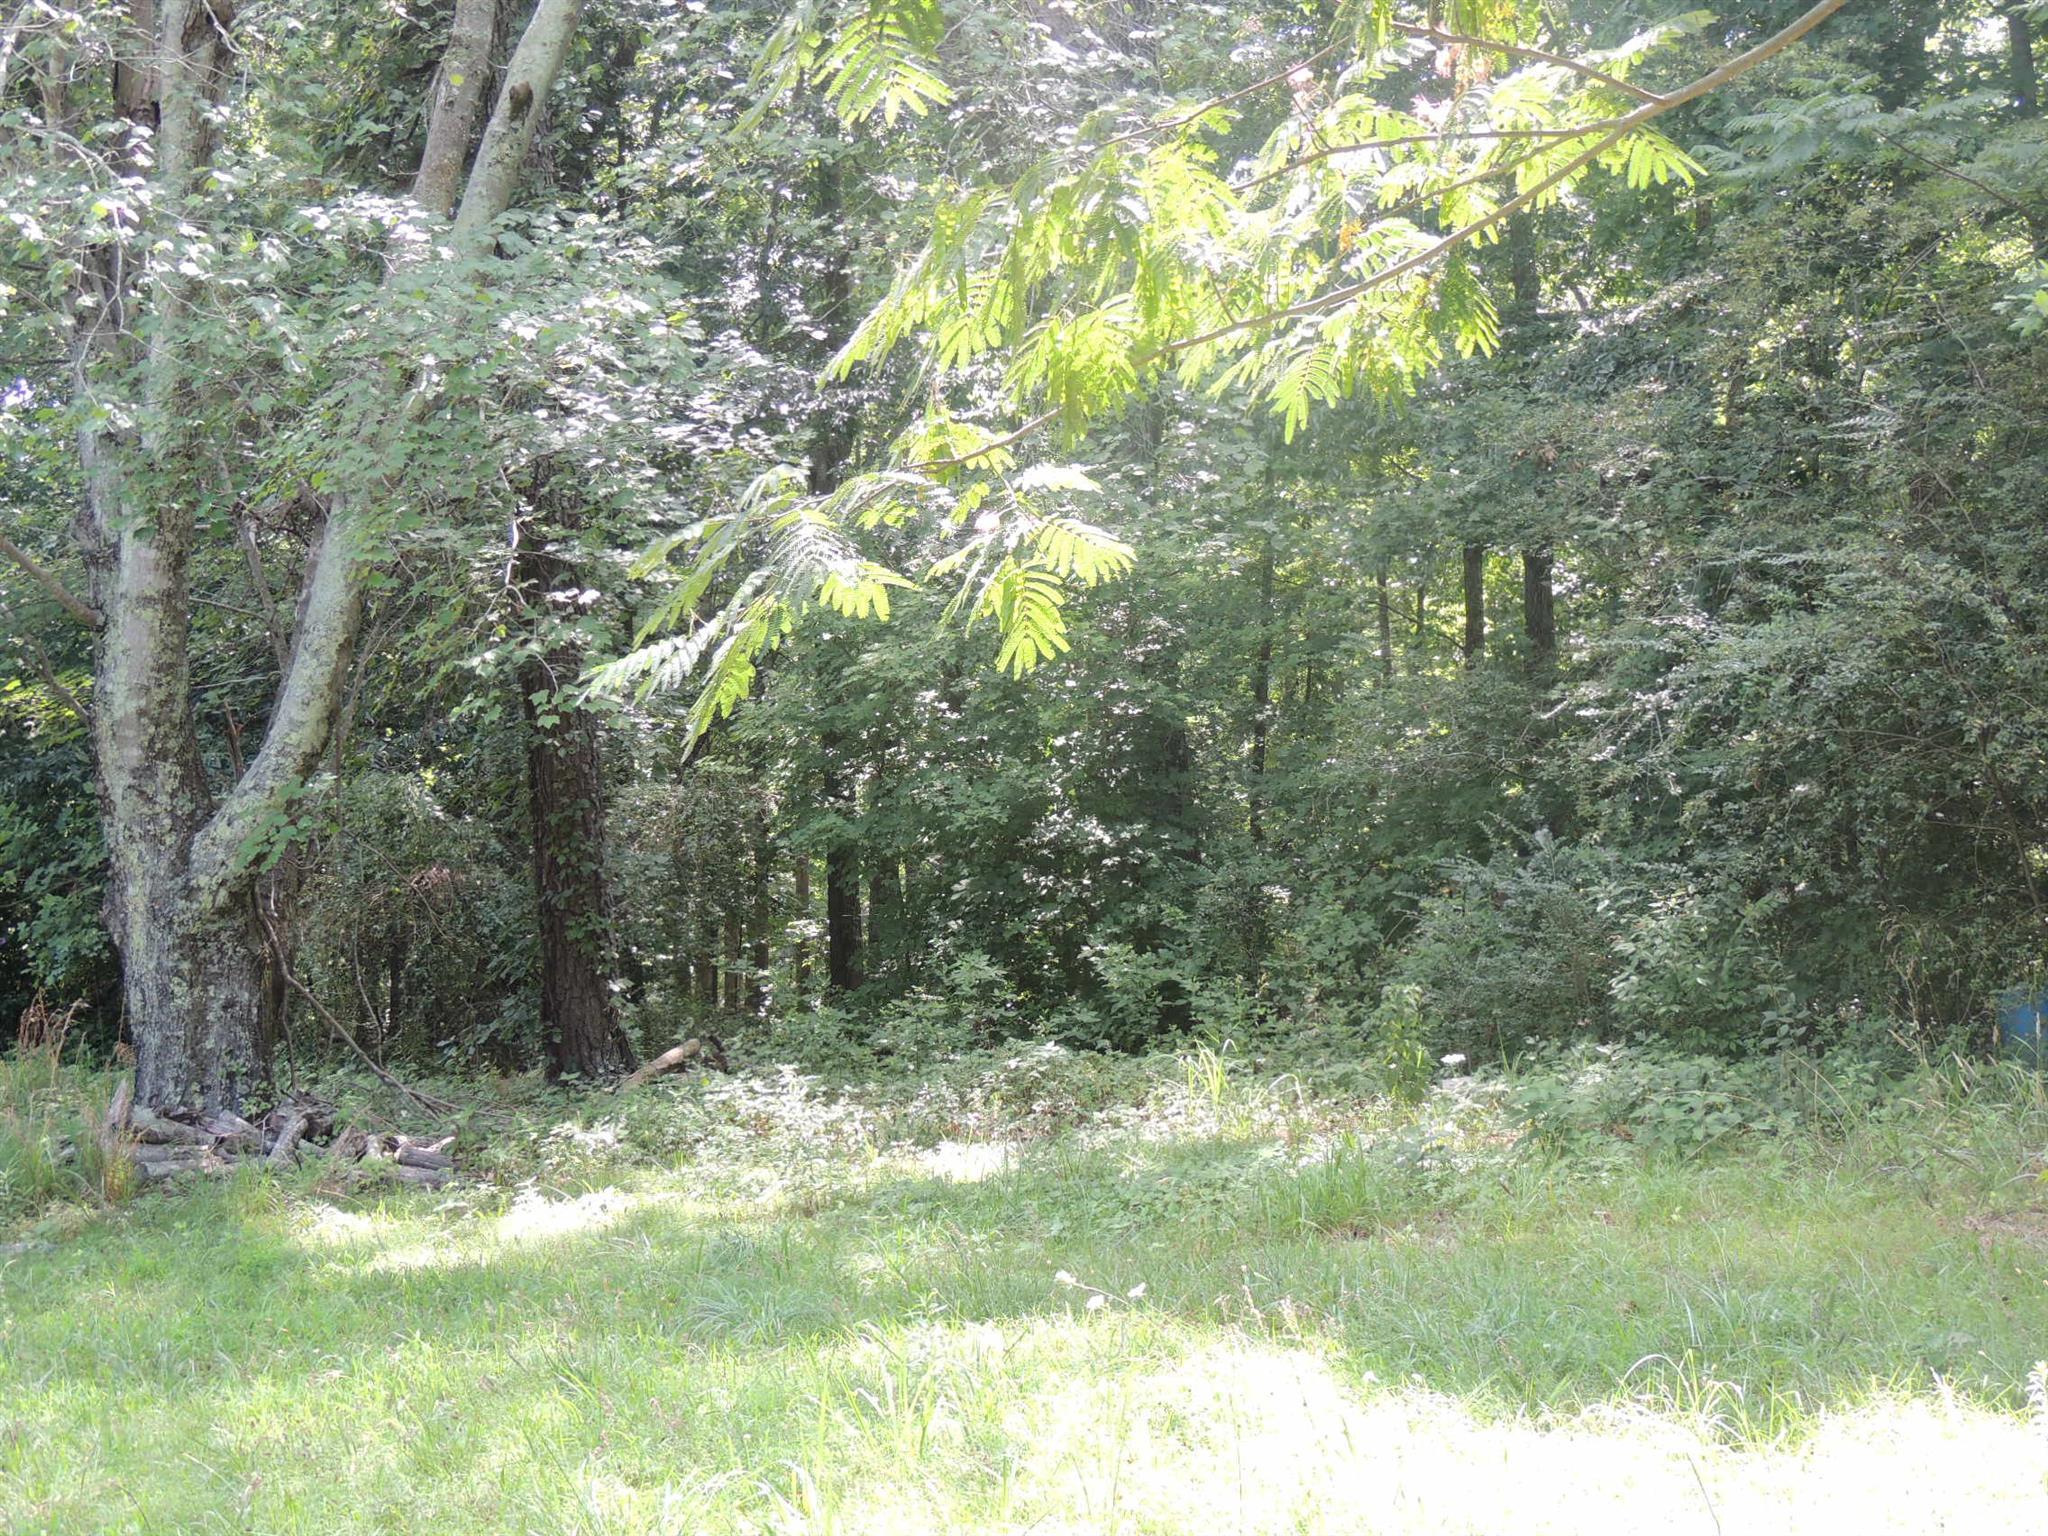 7816 Oscar Green Rd, Primm Springs, TN 38476 - Primm Springs, TN real estate listing